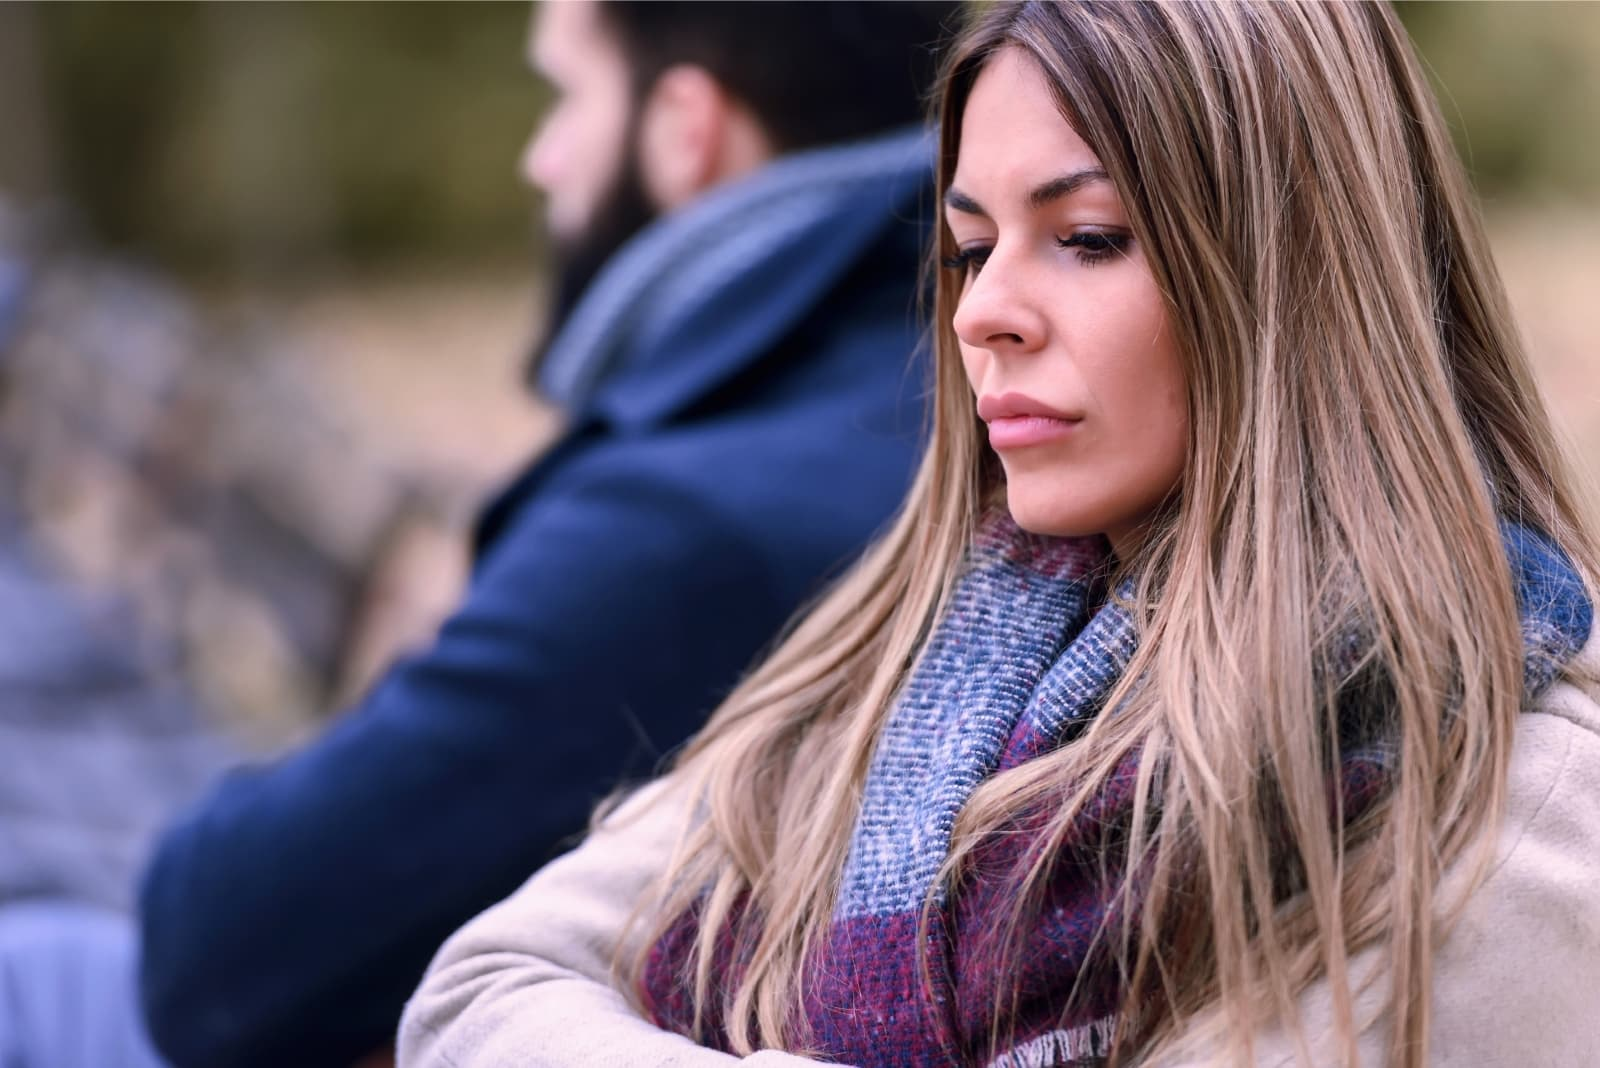 sad woman with scarf sitting near man outdoor